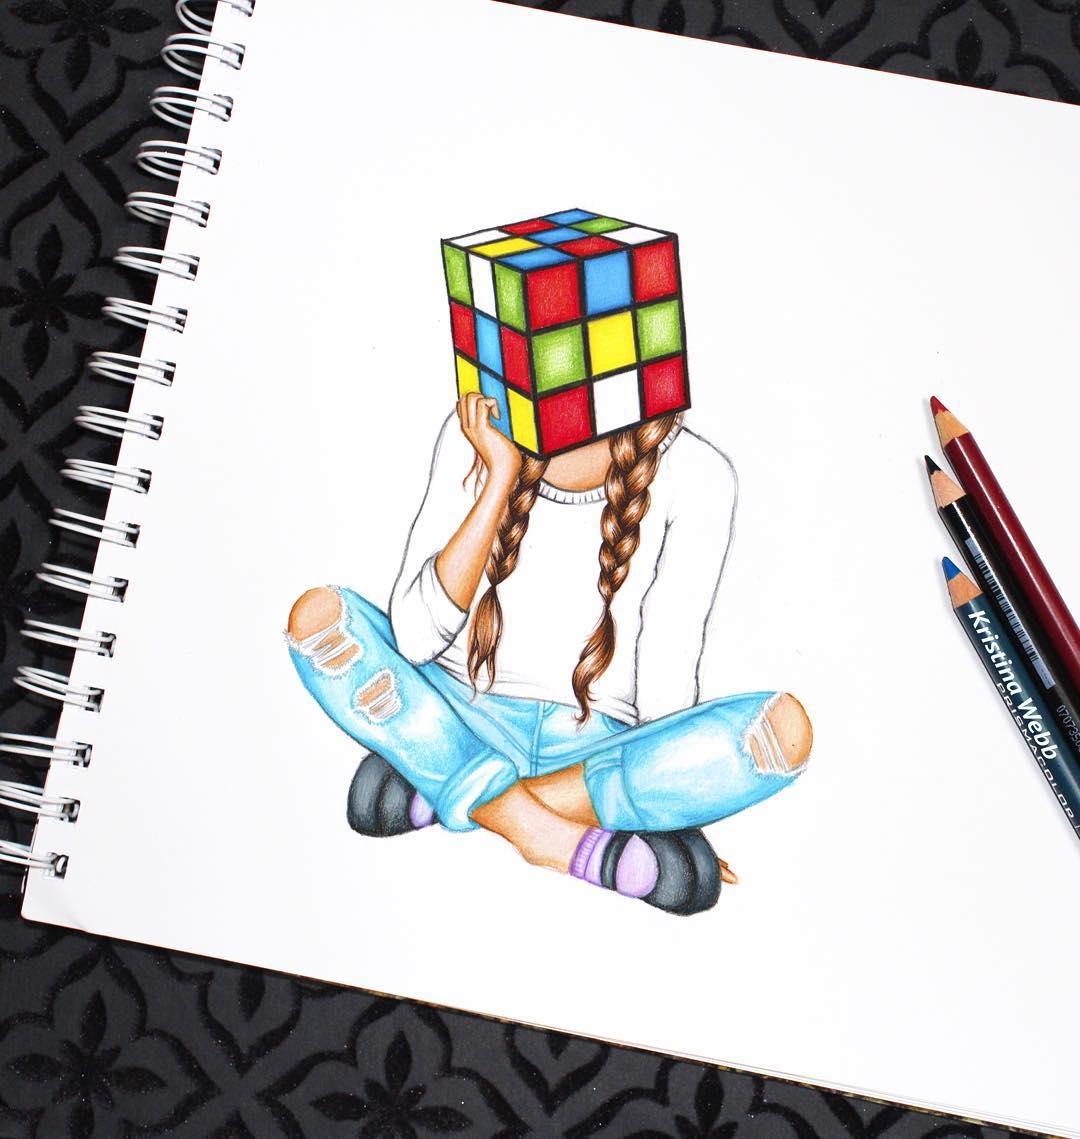 11-Puzzled-Kristina-Webb-colour-me-creative-Drawings-Exploring-a-Range-Different-Techniques-www-designstack-co